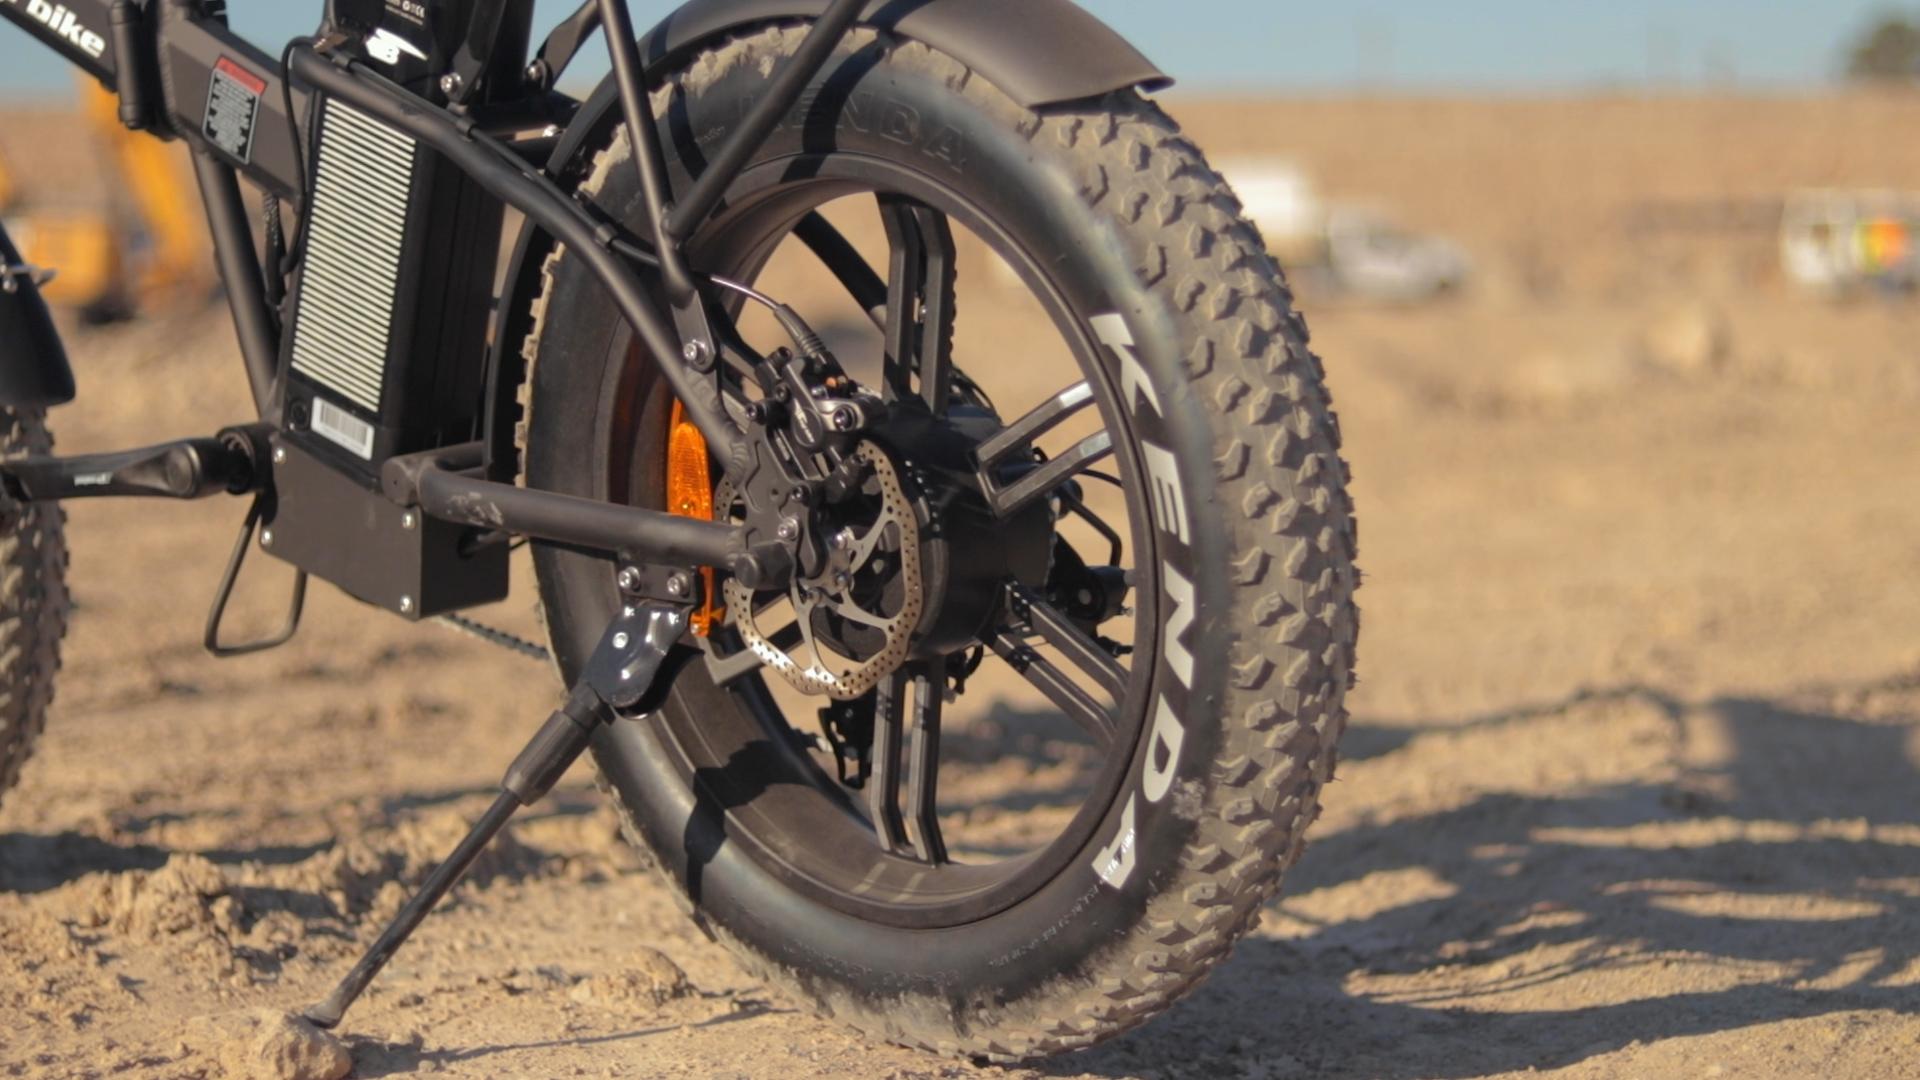 electrified-reviews-bagibike-b20-premium-electric-bike-review-bafang-500-watt-motor-2.jpg